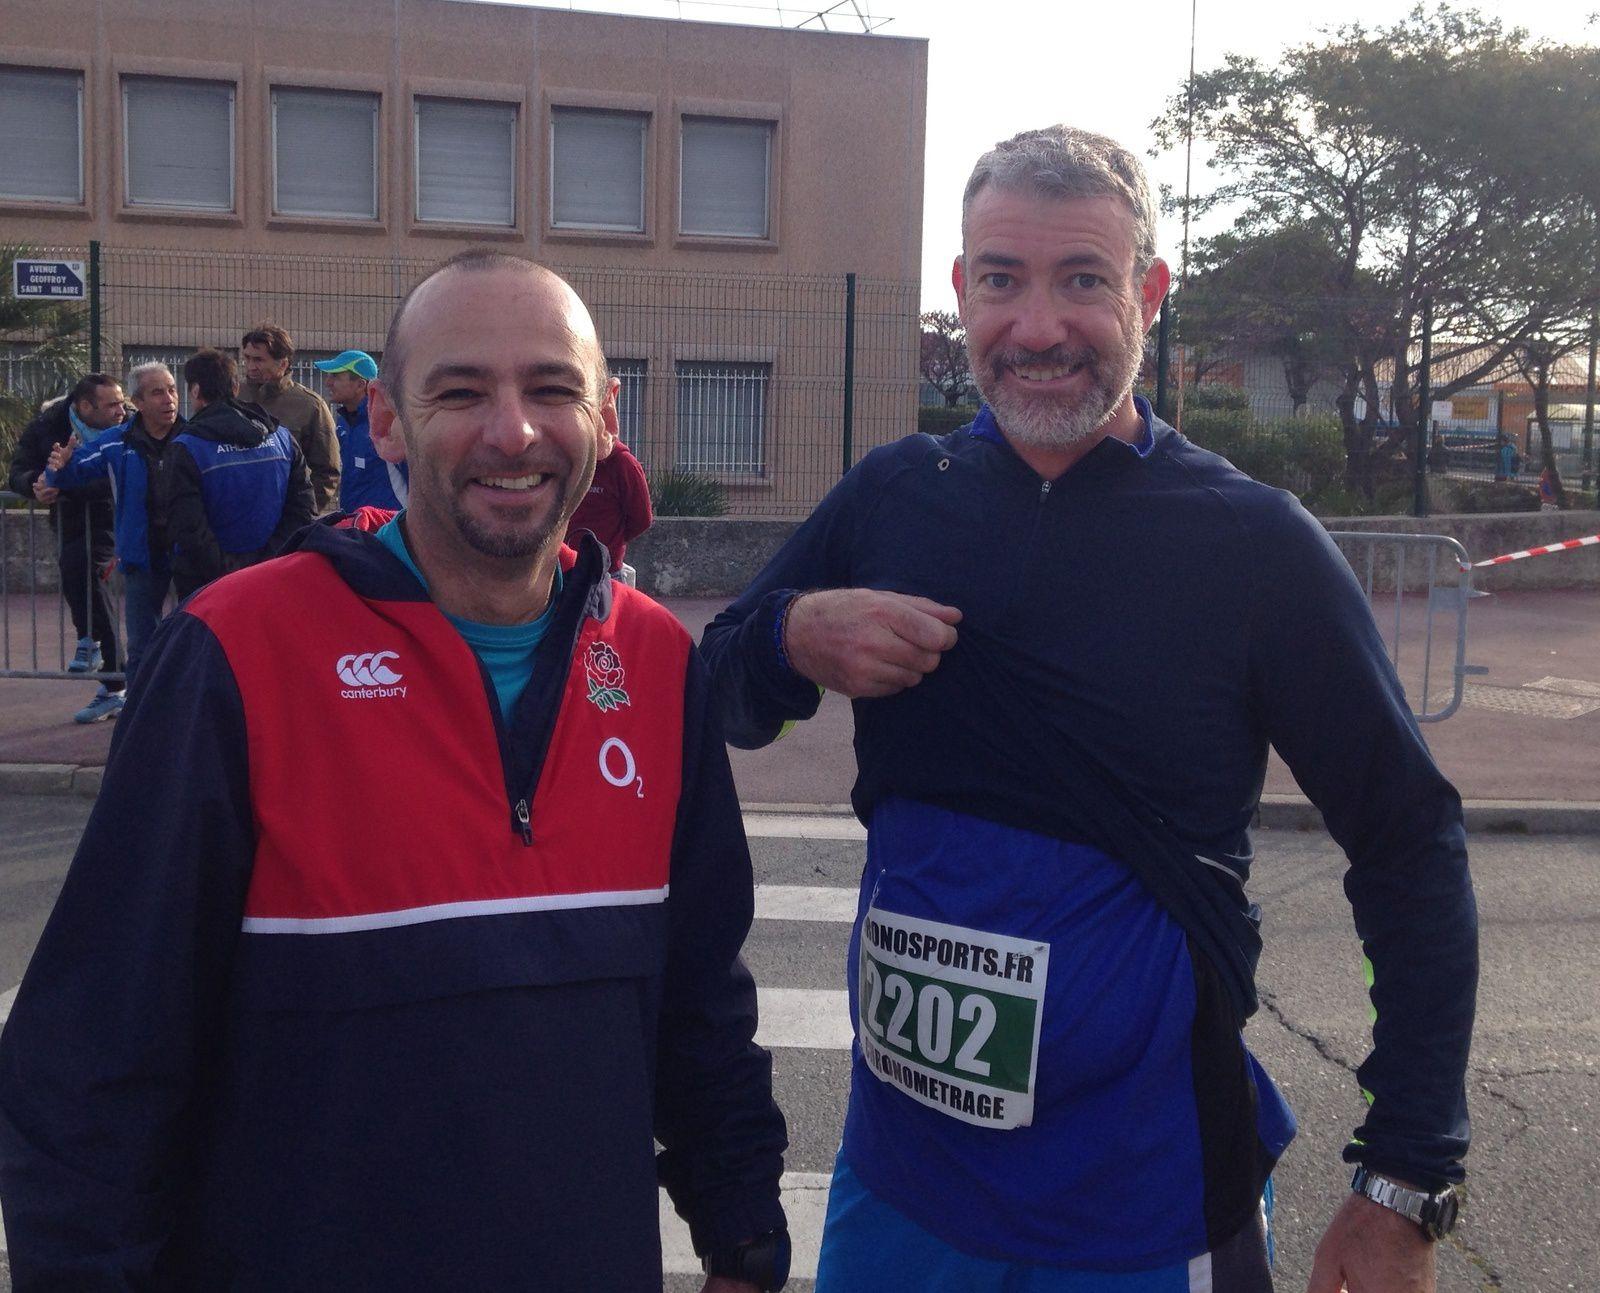 Hormis les filles, voici 2 semi-marathoniens courageux